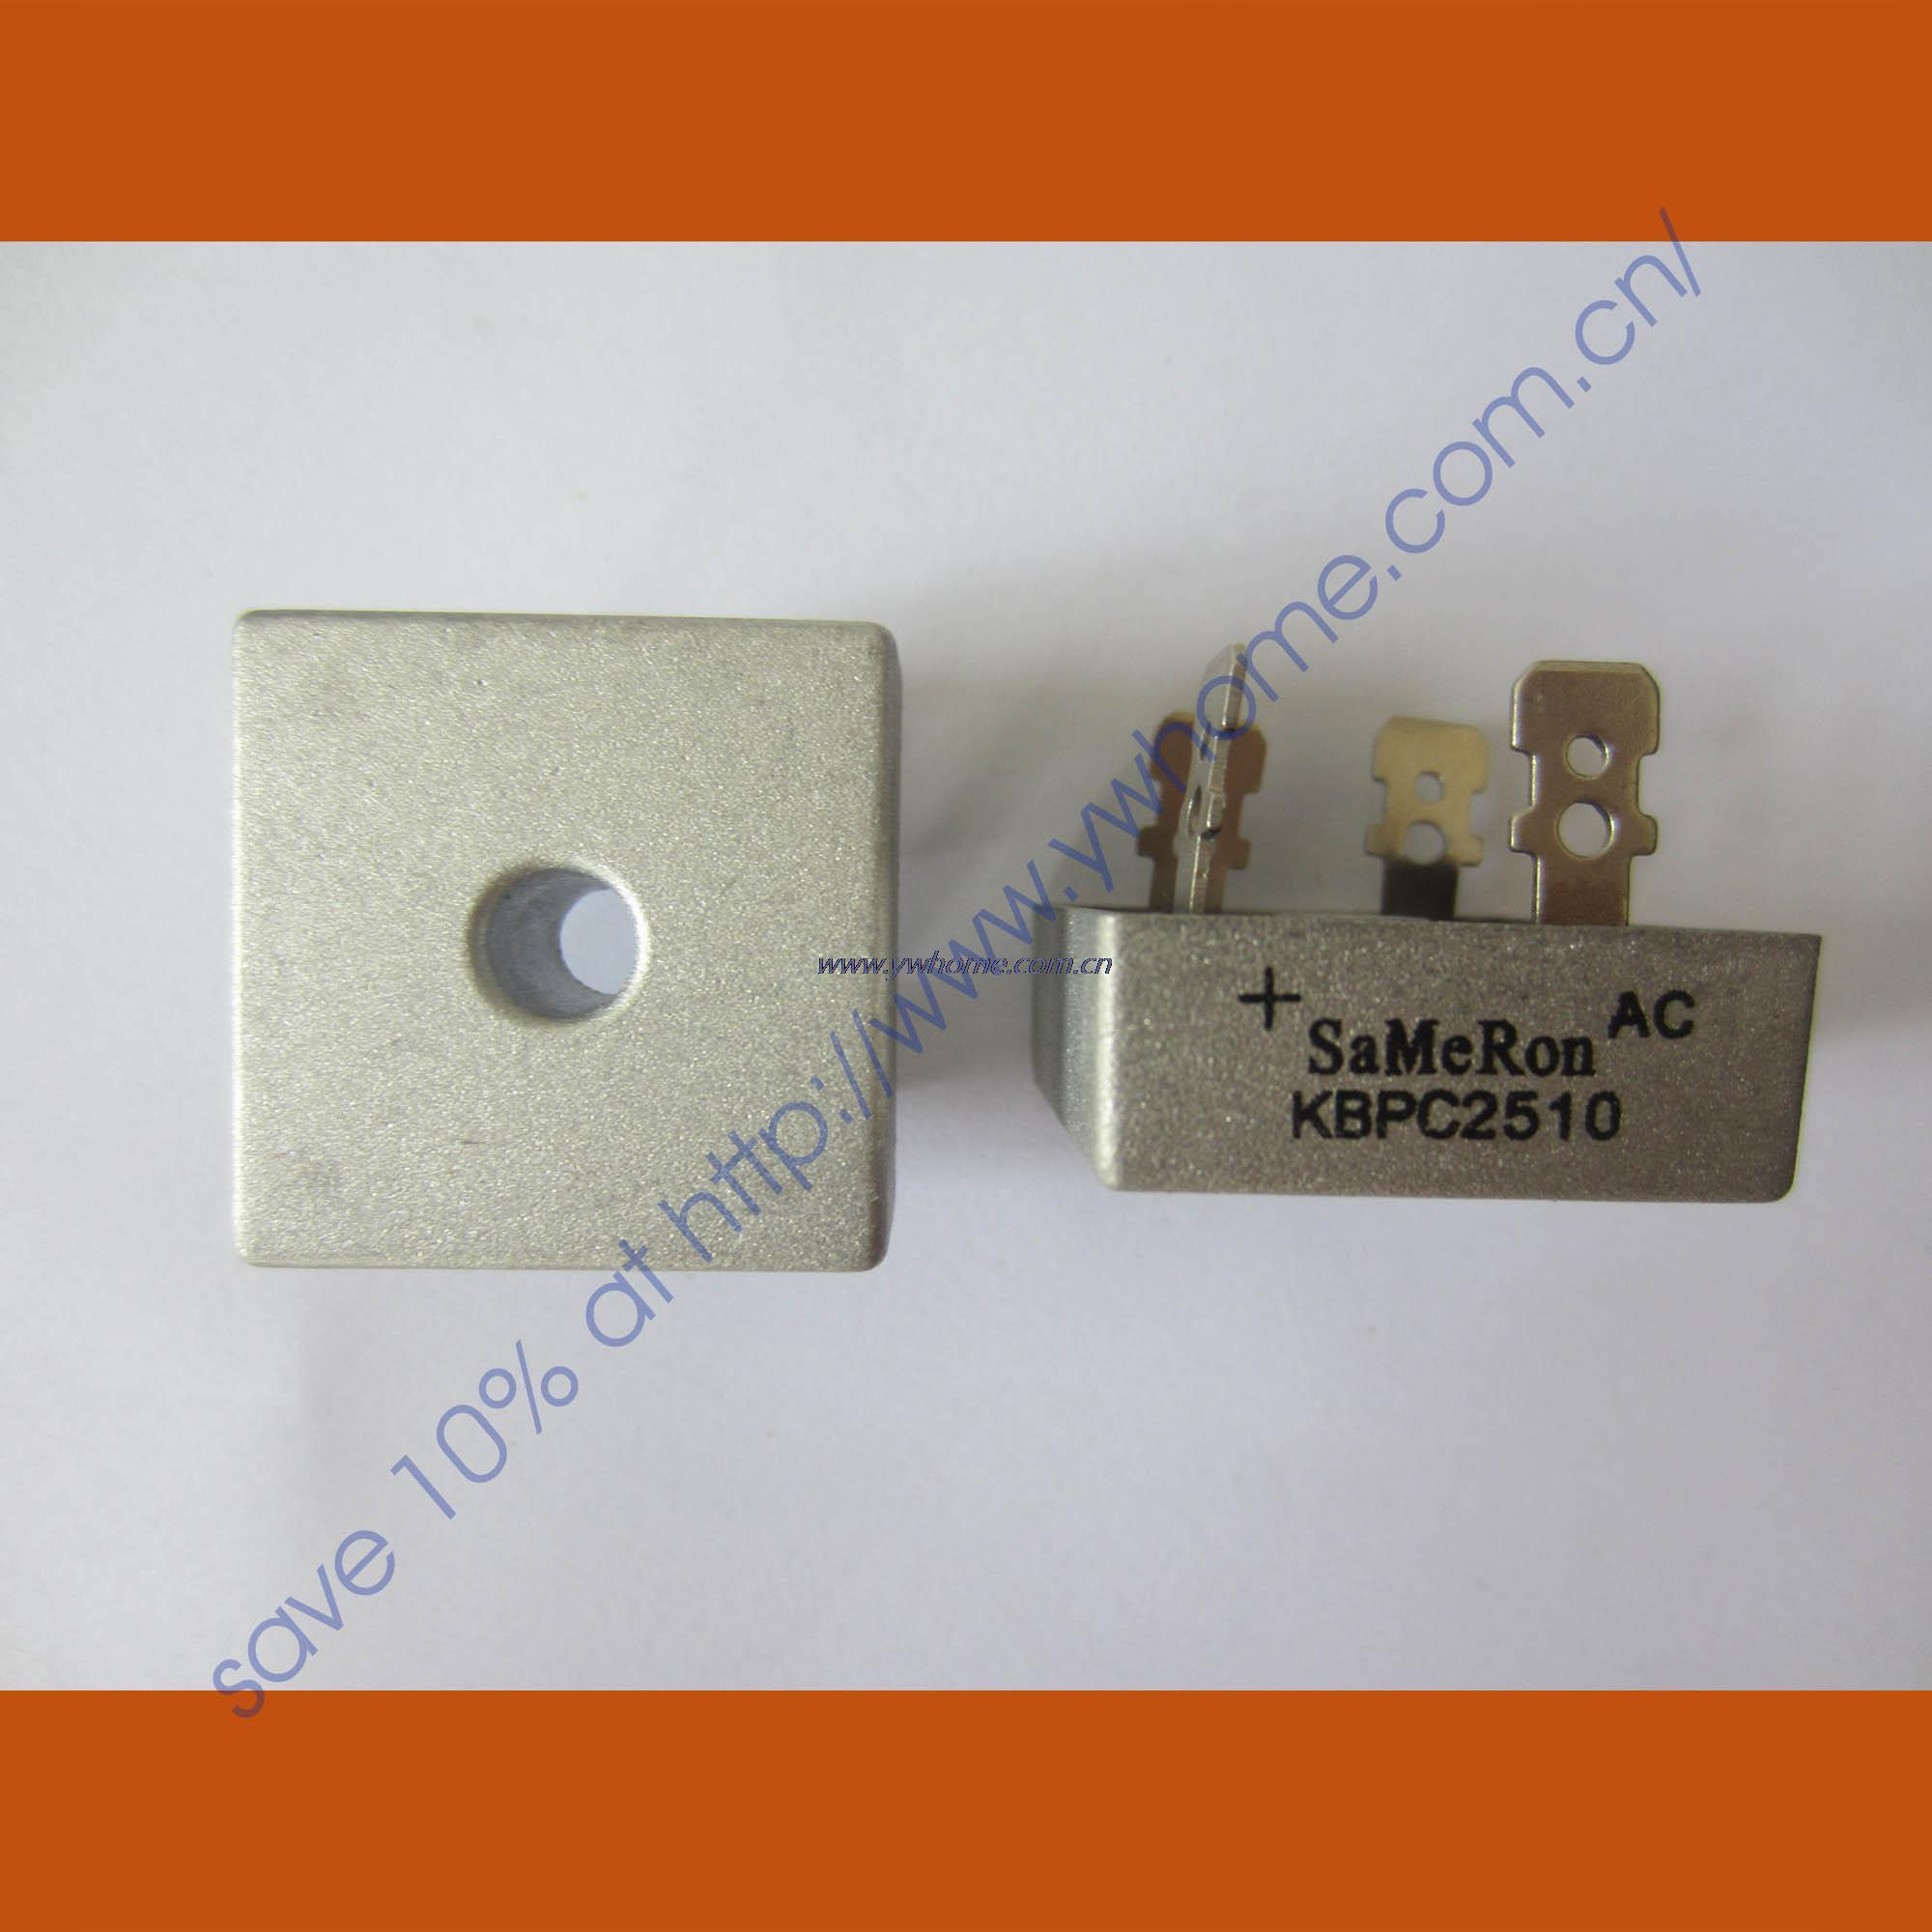 New SEP KBPC2510 Metal Case 25A 1000V Bridge Rectifier